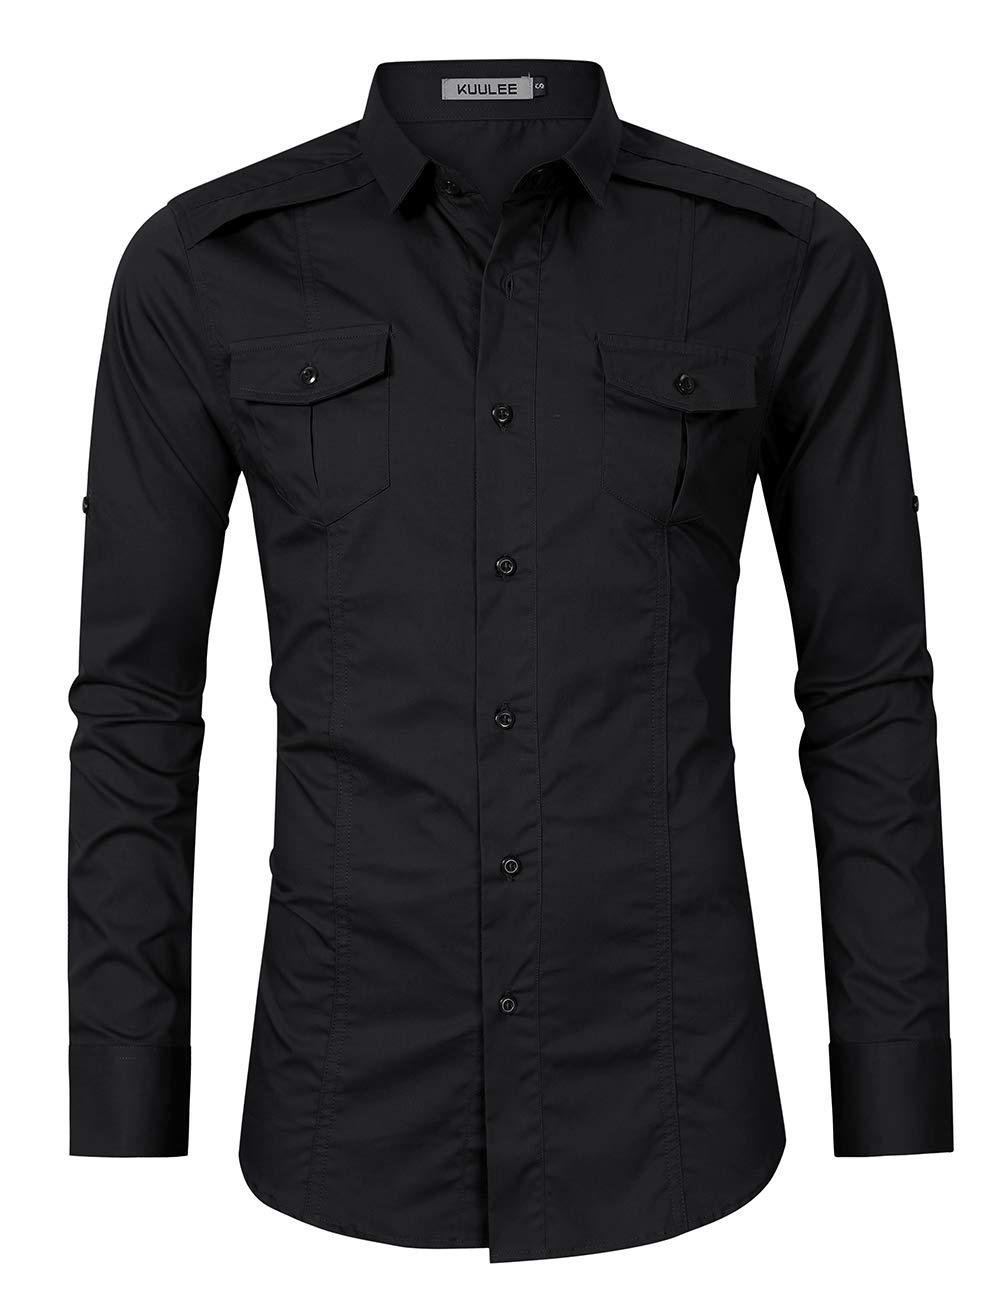 fa7d718a38c Kuulee Men s Casual Slim Fit Short Sleeve Button Down Dress Shirts Cargo  Shirt (S